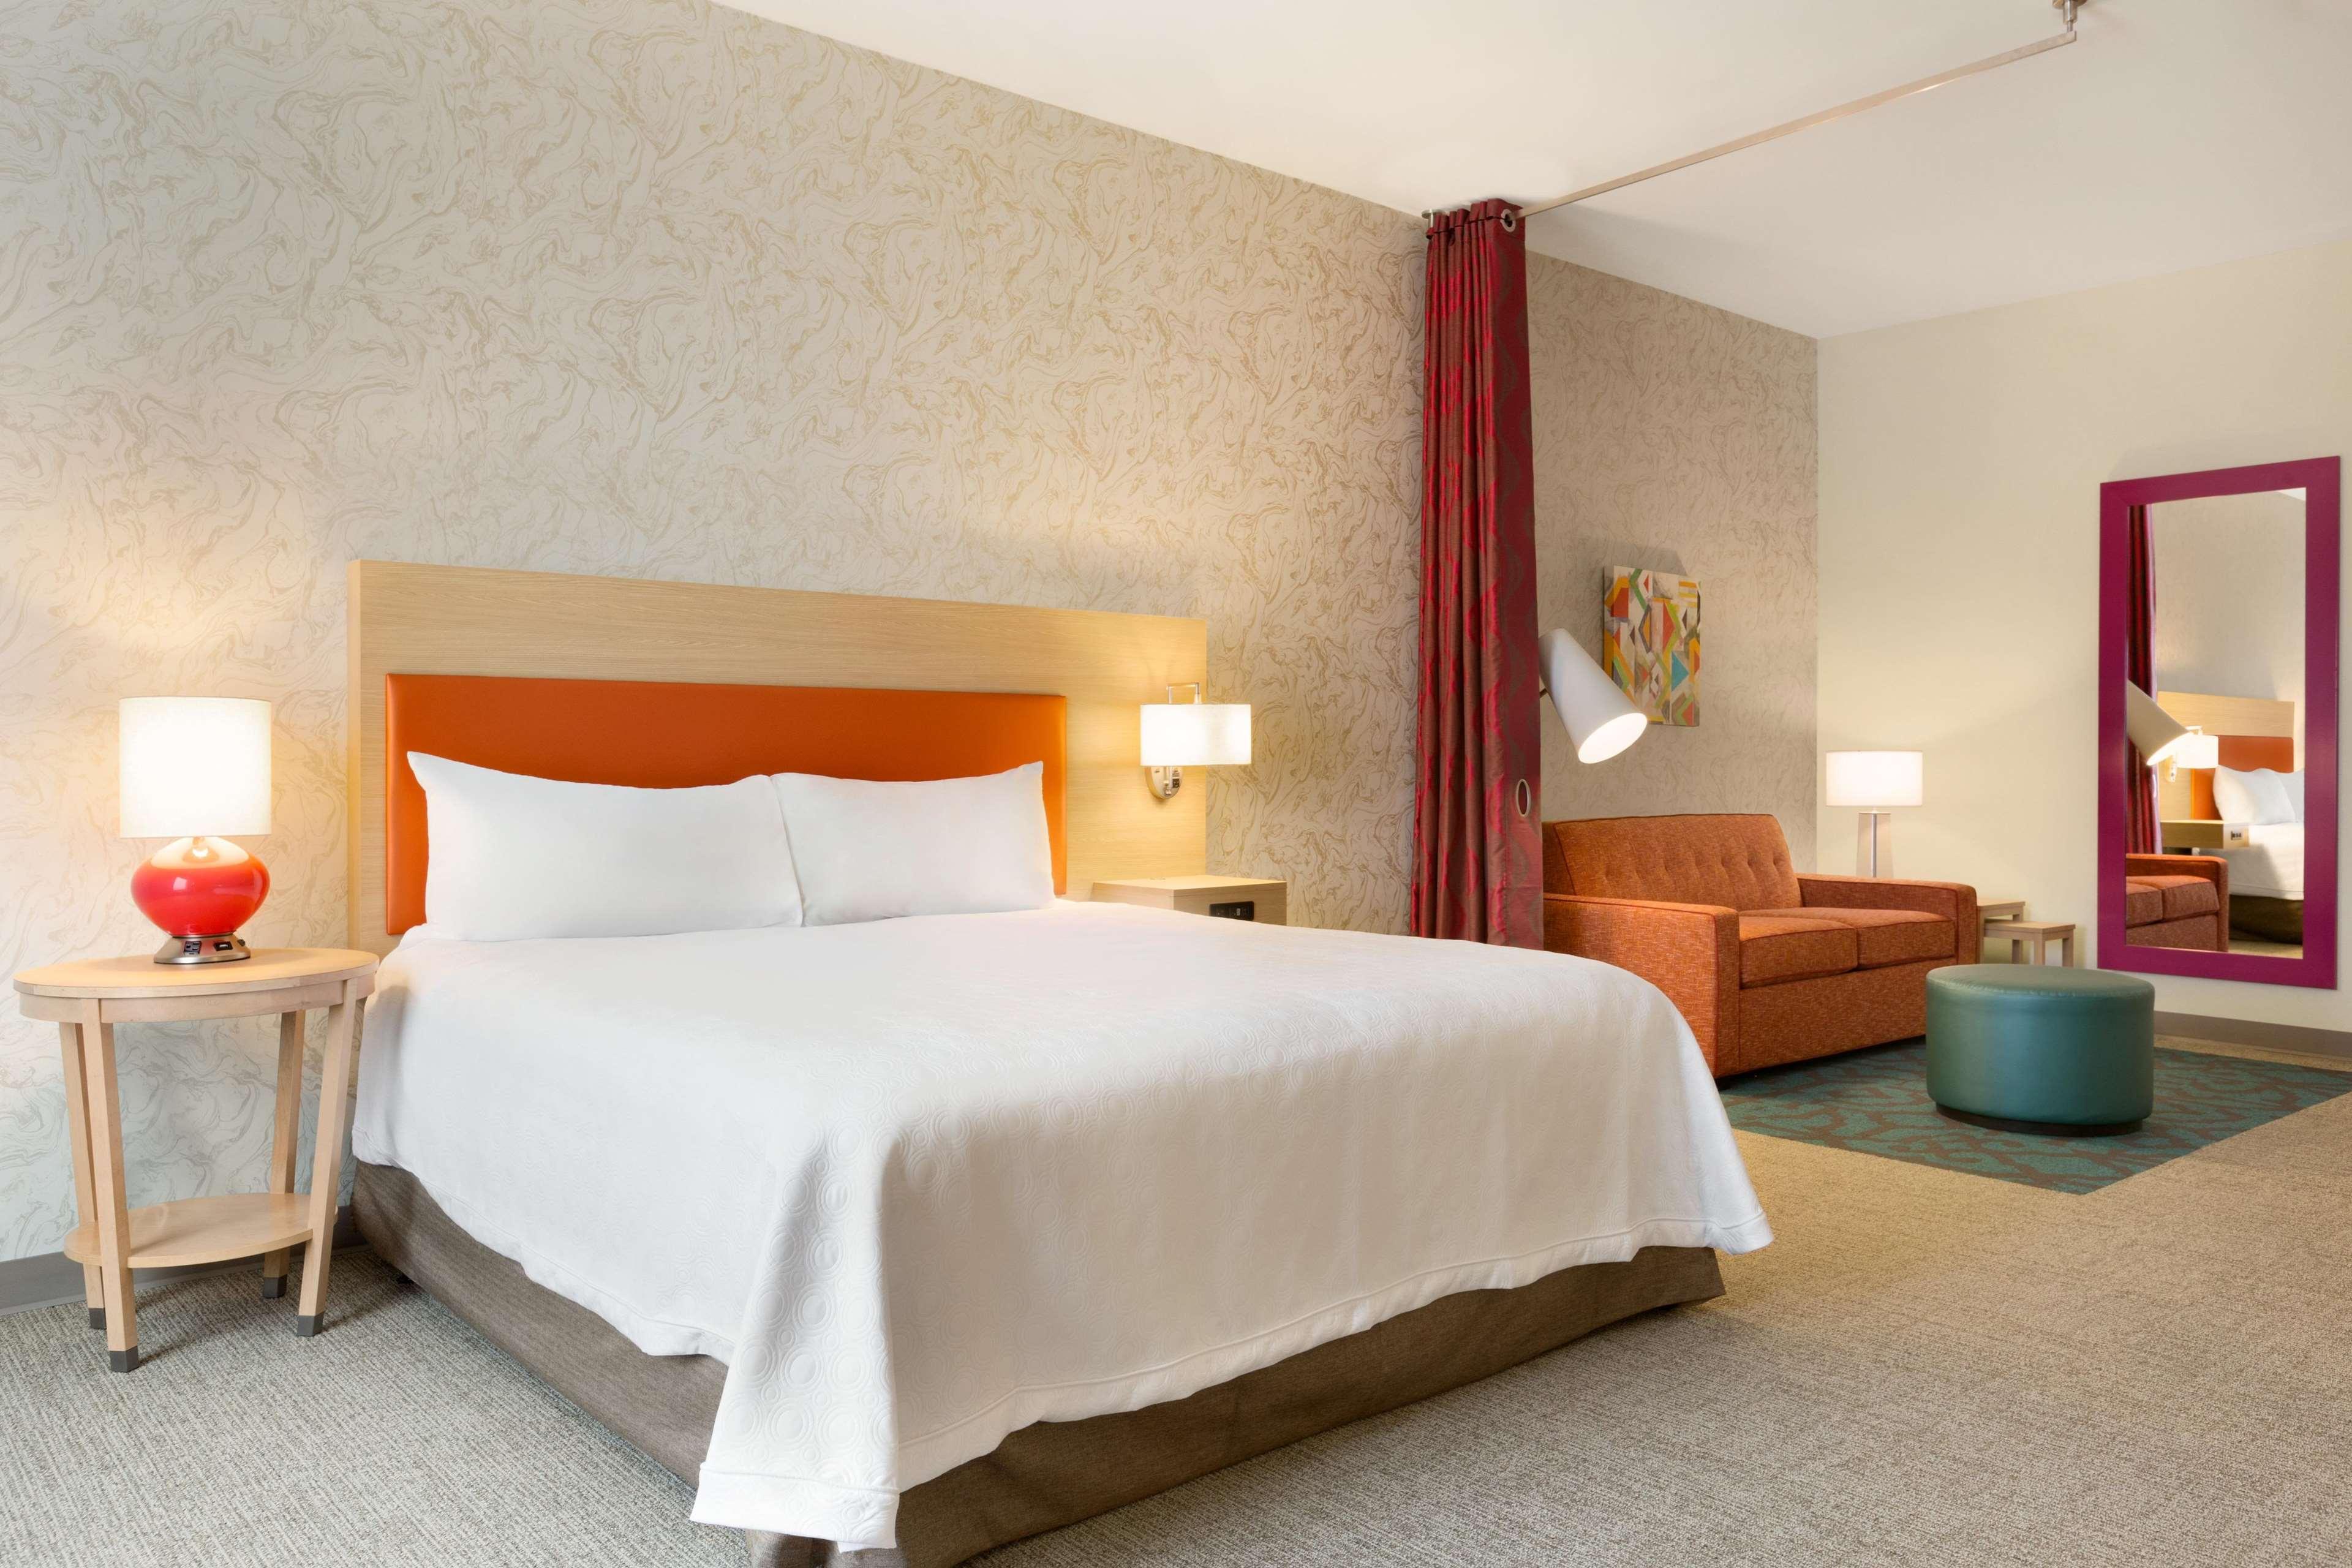 Home2 Suites by Hilton Florence Cincinnati Airport South image 13